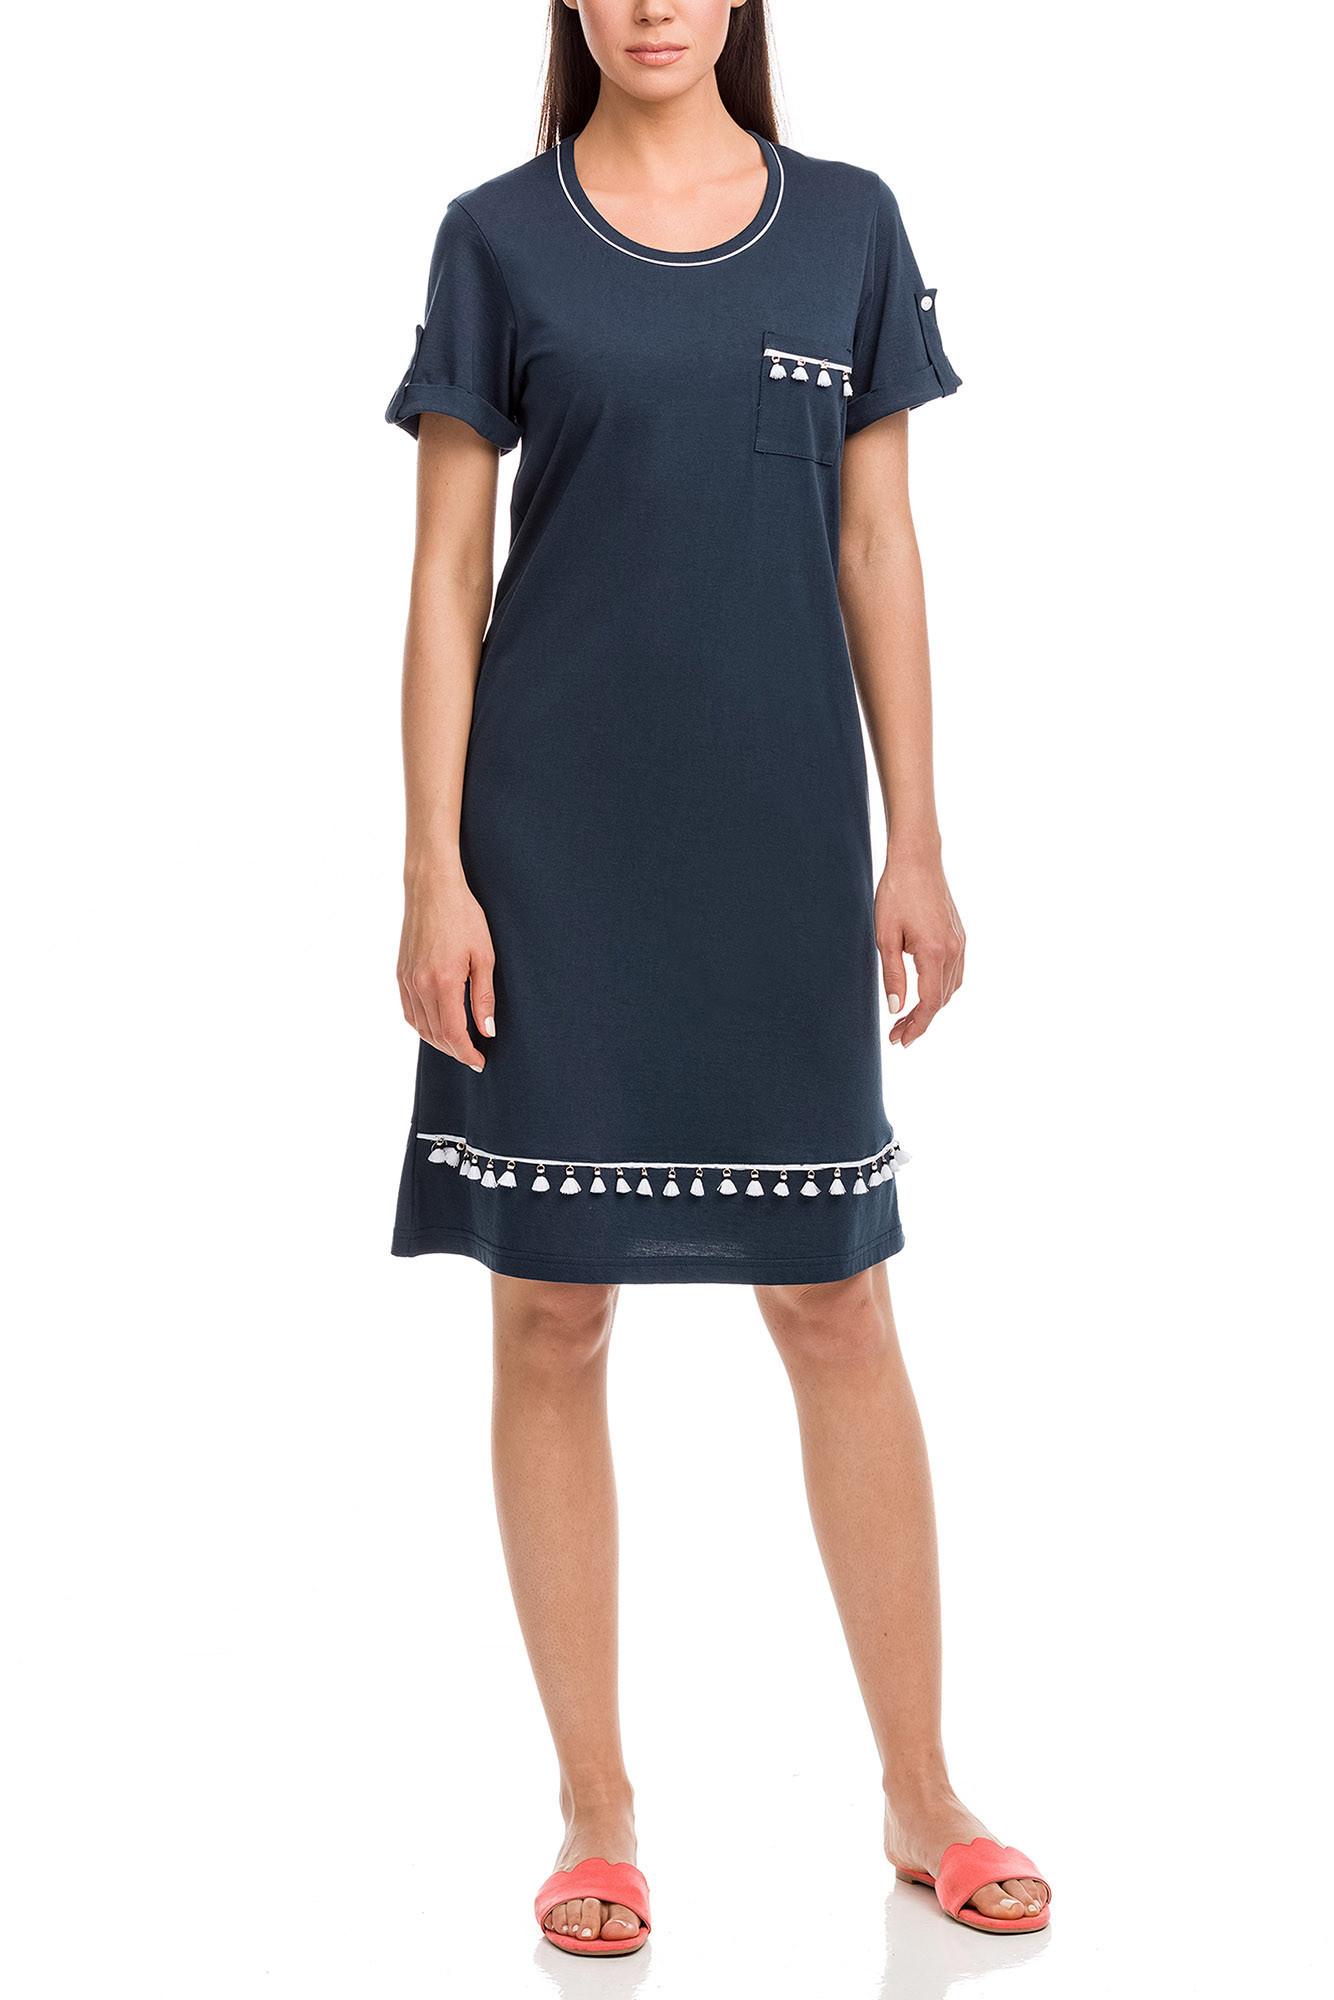 Vamp - Dámske šaty 12595 - Vamp blue oxford m